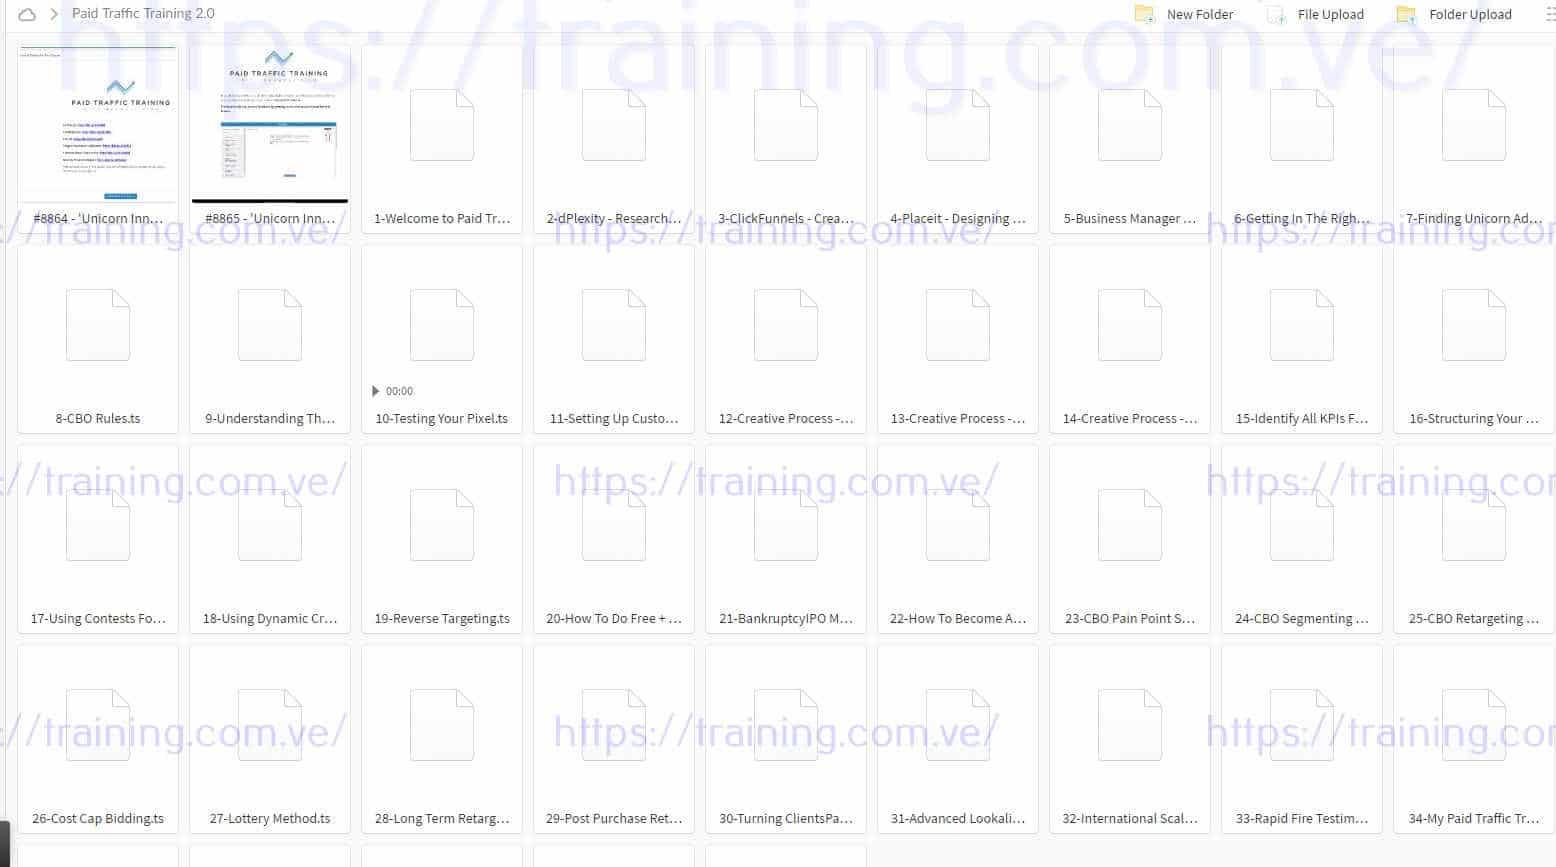 Paid Traffic 2.0 Training by Maxwell Finn torrent